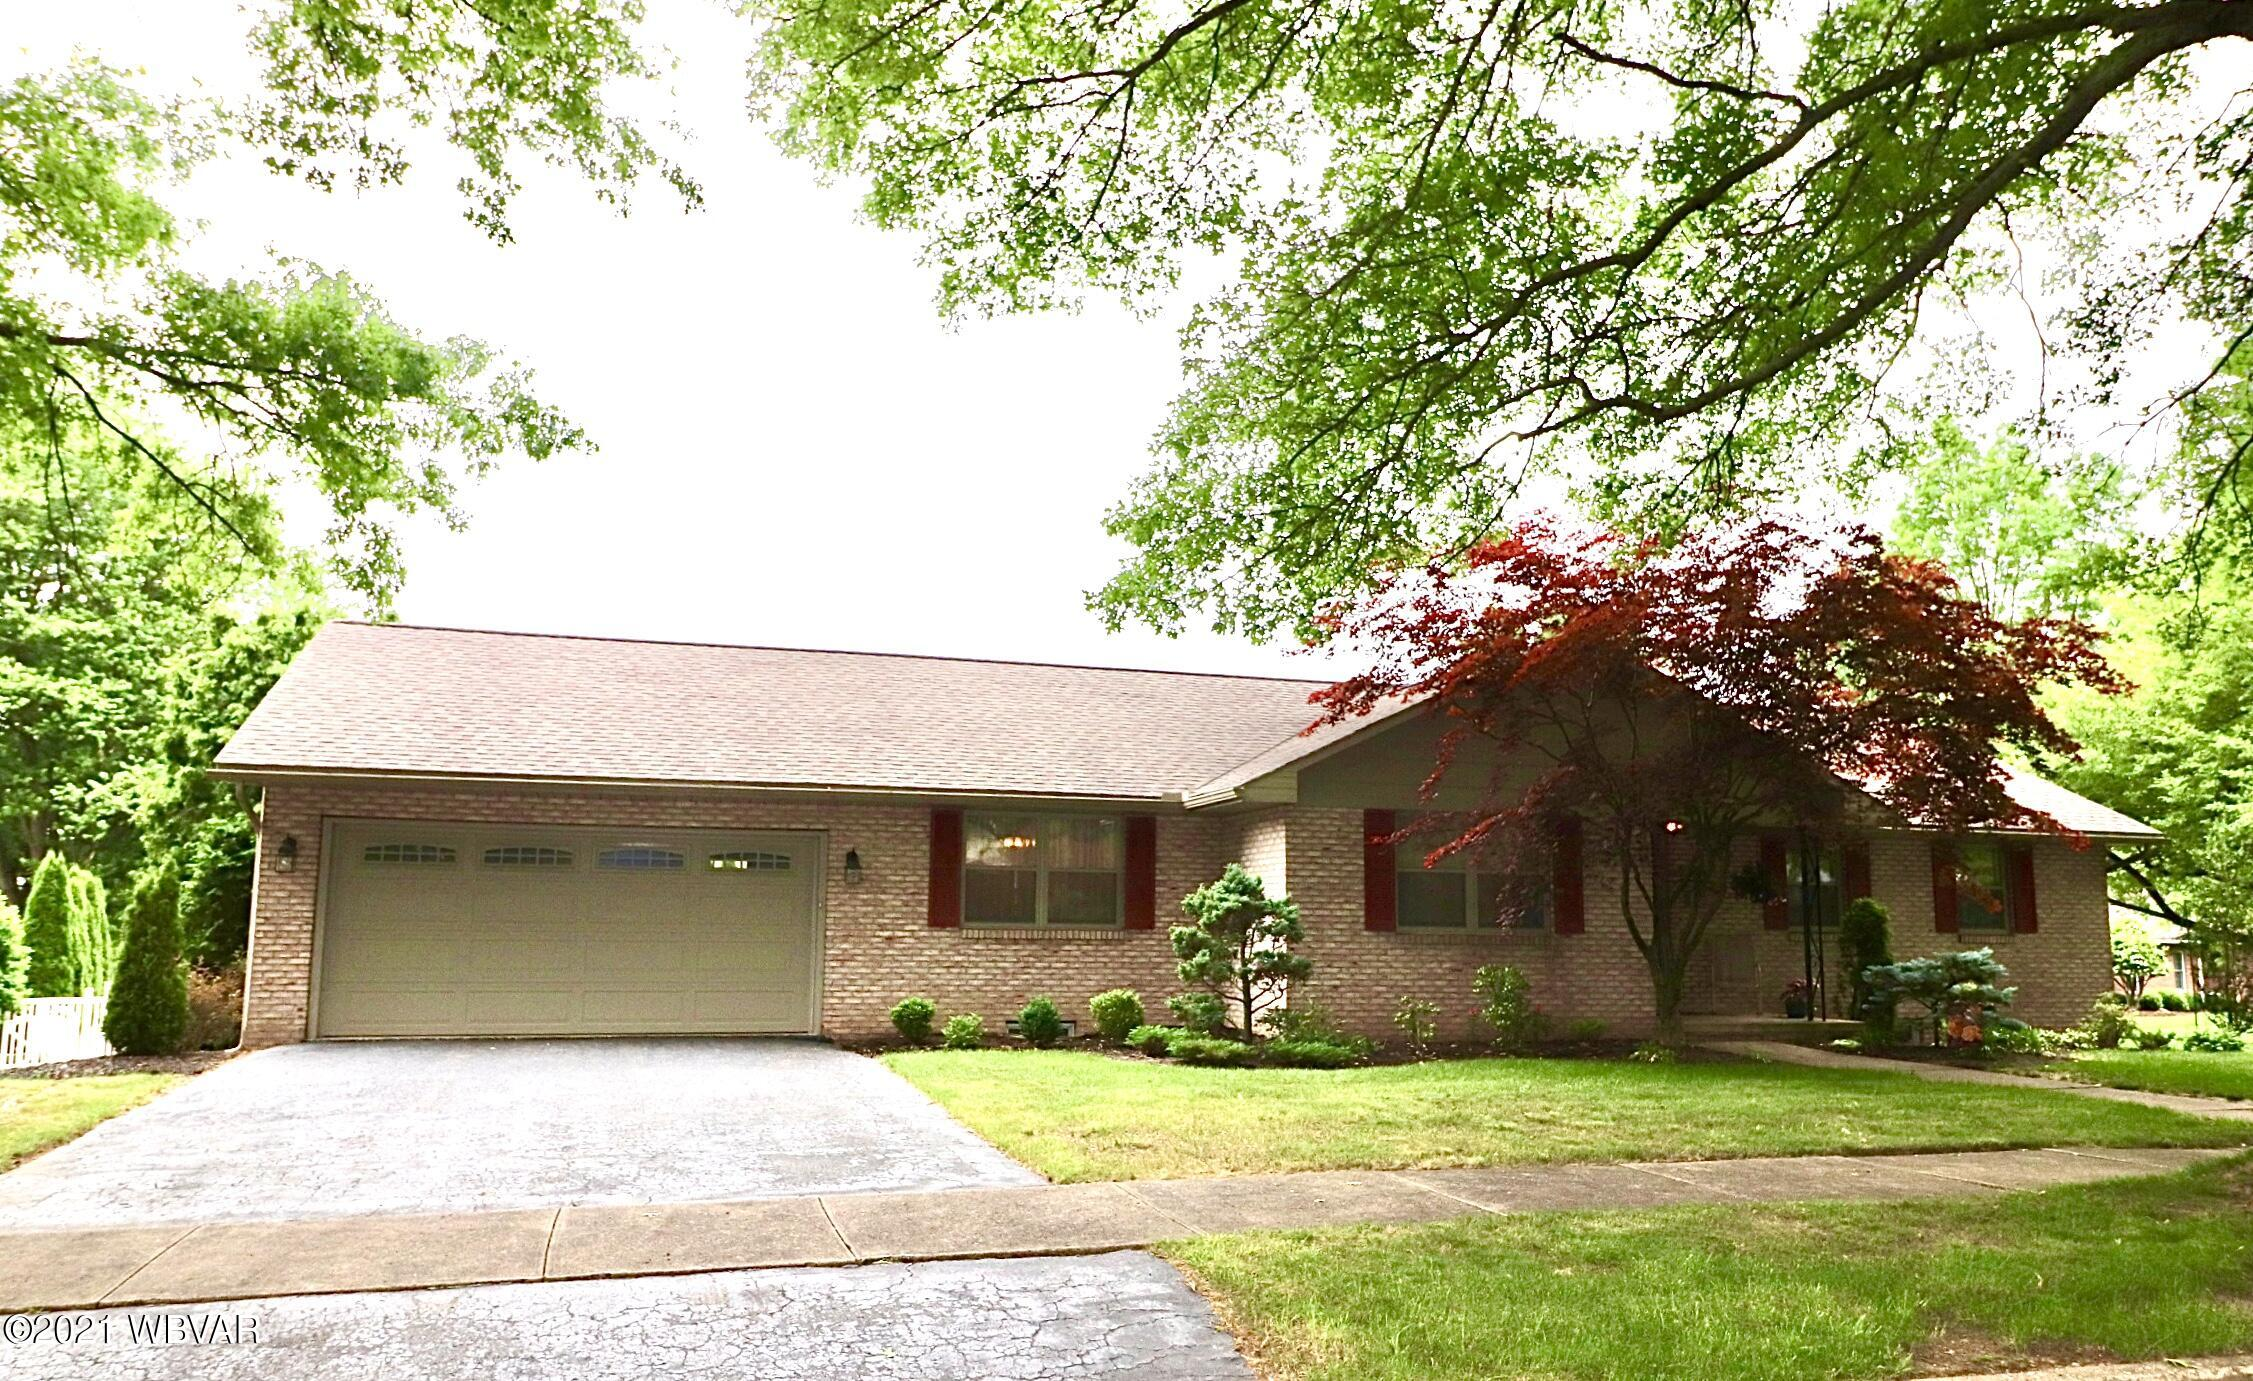 815 CANTERBURY ROAD, Williamsport, PA 17701, 3 Bedrooms Bedrooms, ,3 BathroomsBathrooms,Residential,For sale,CANTERBURY,WB-92756